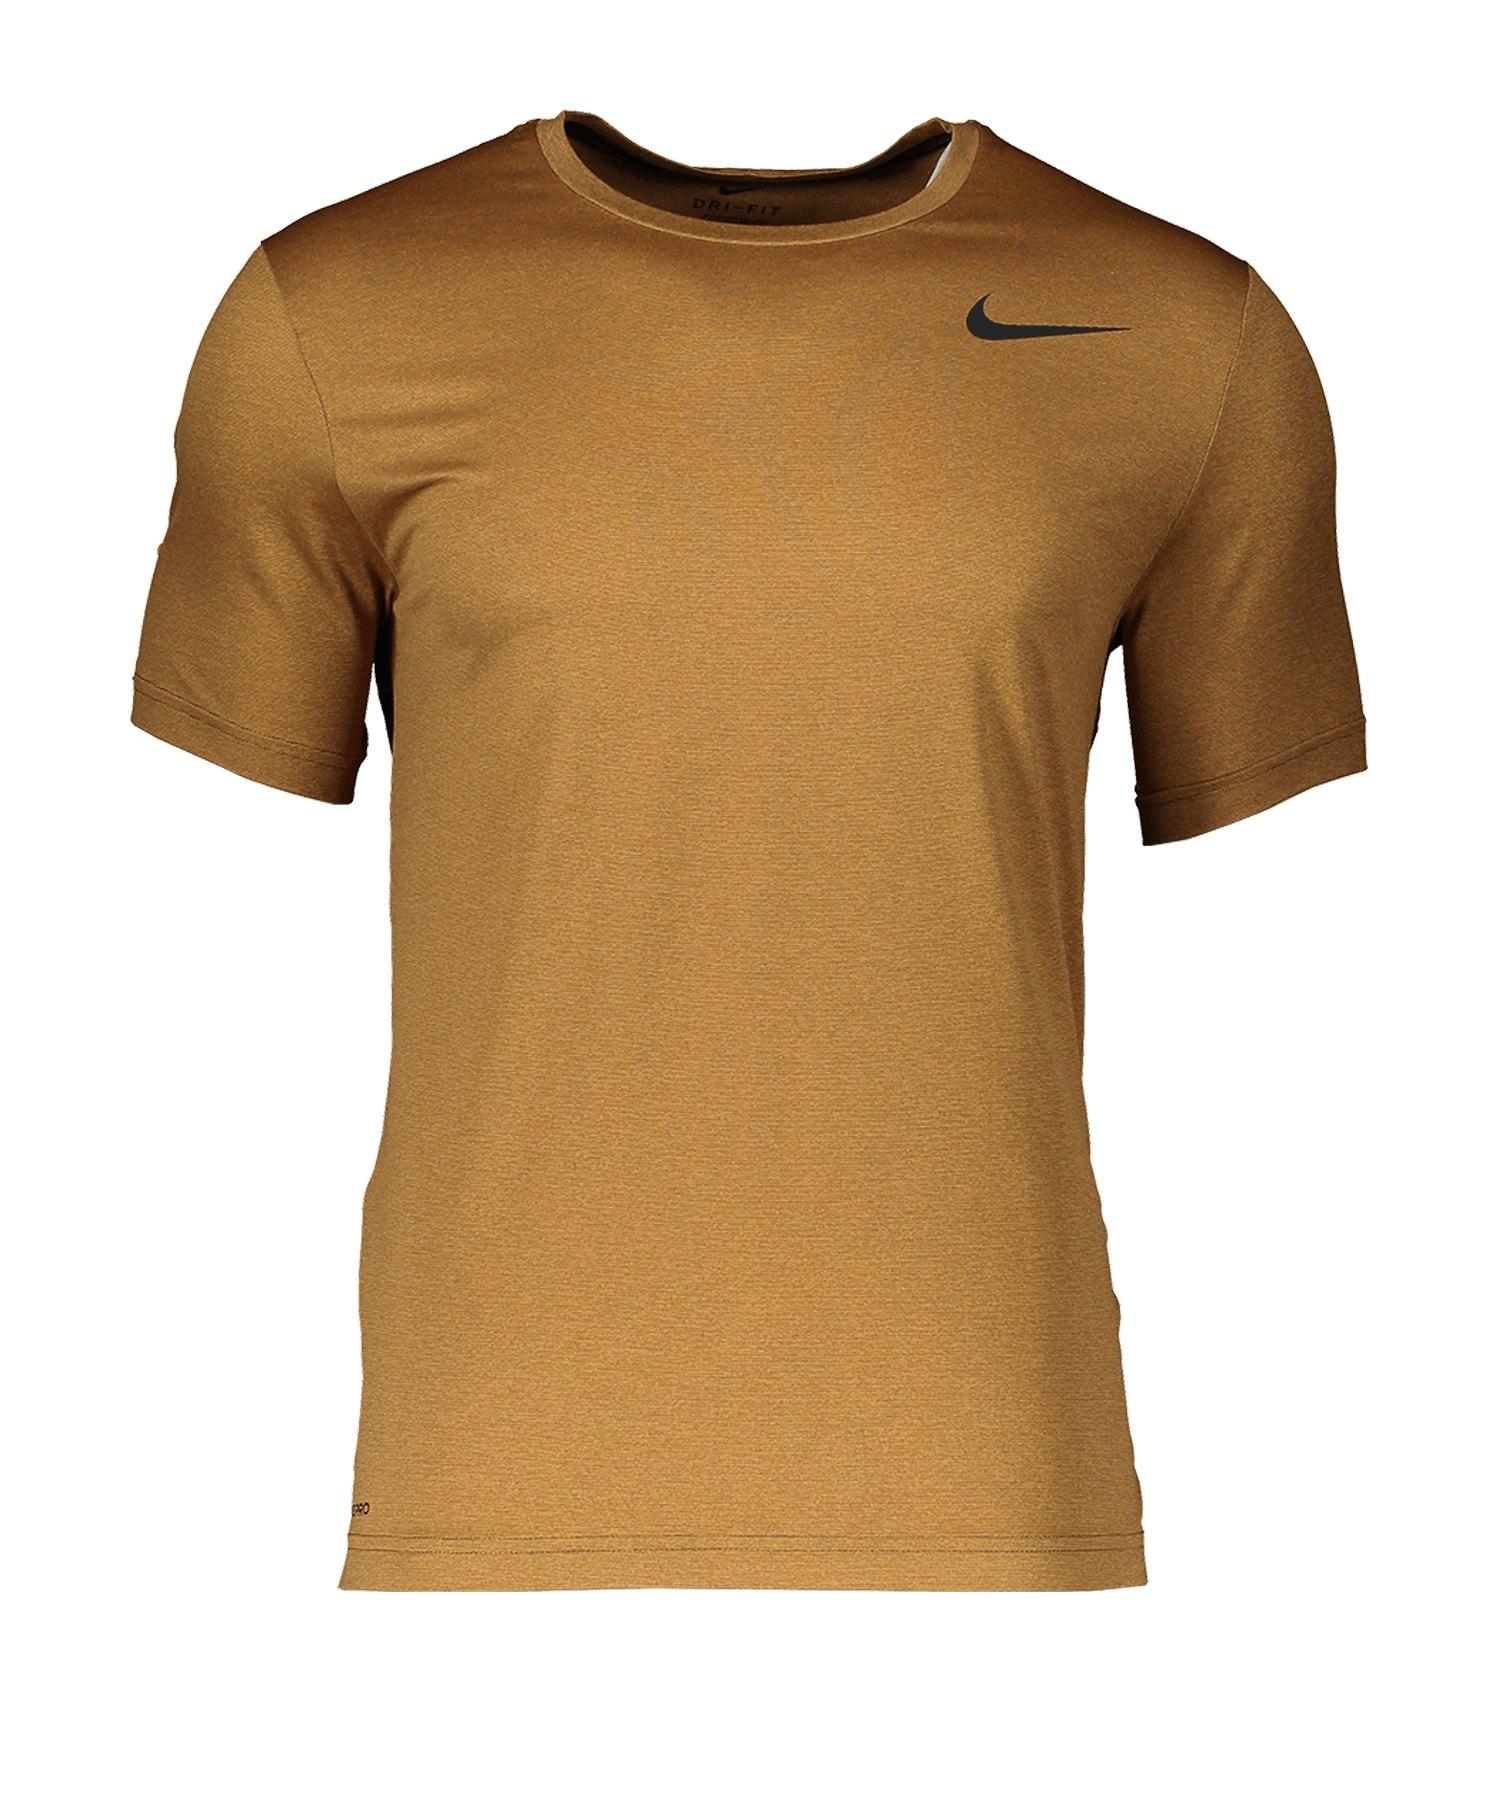 Nike Pro Shirt Shortsleeve Braun F325 - braun